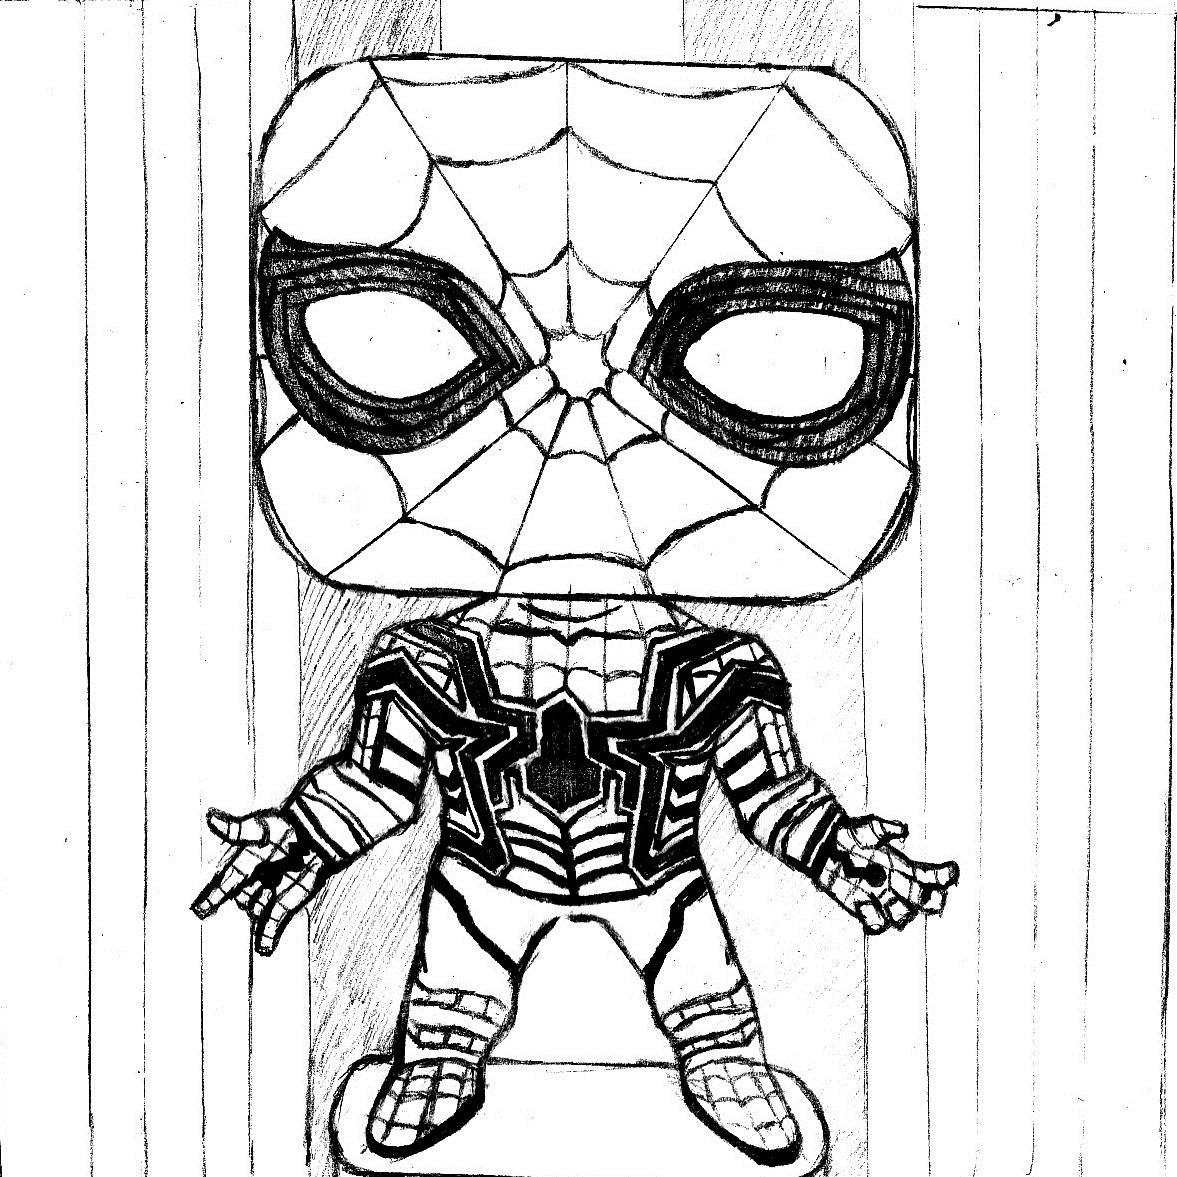 Spiderman Black Suit Drawing at GetDrawings | Free download